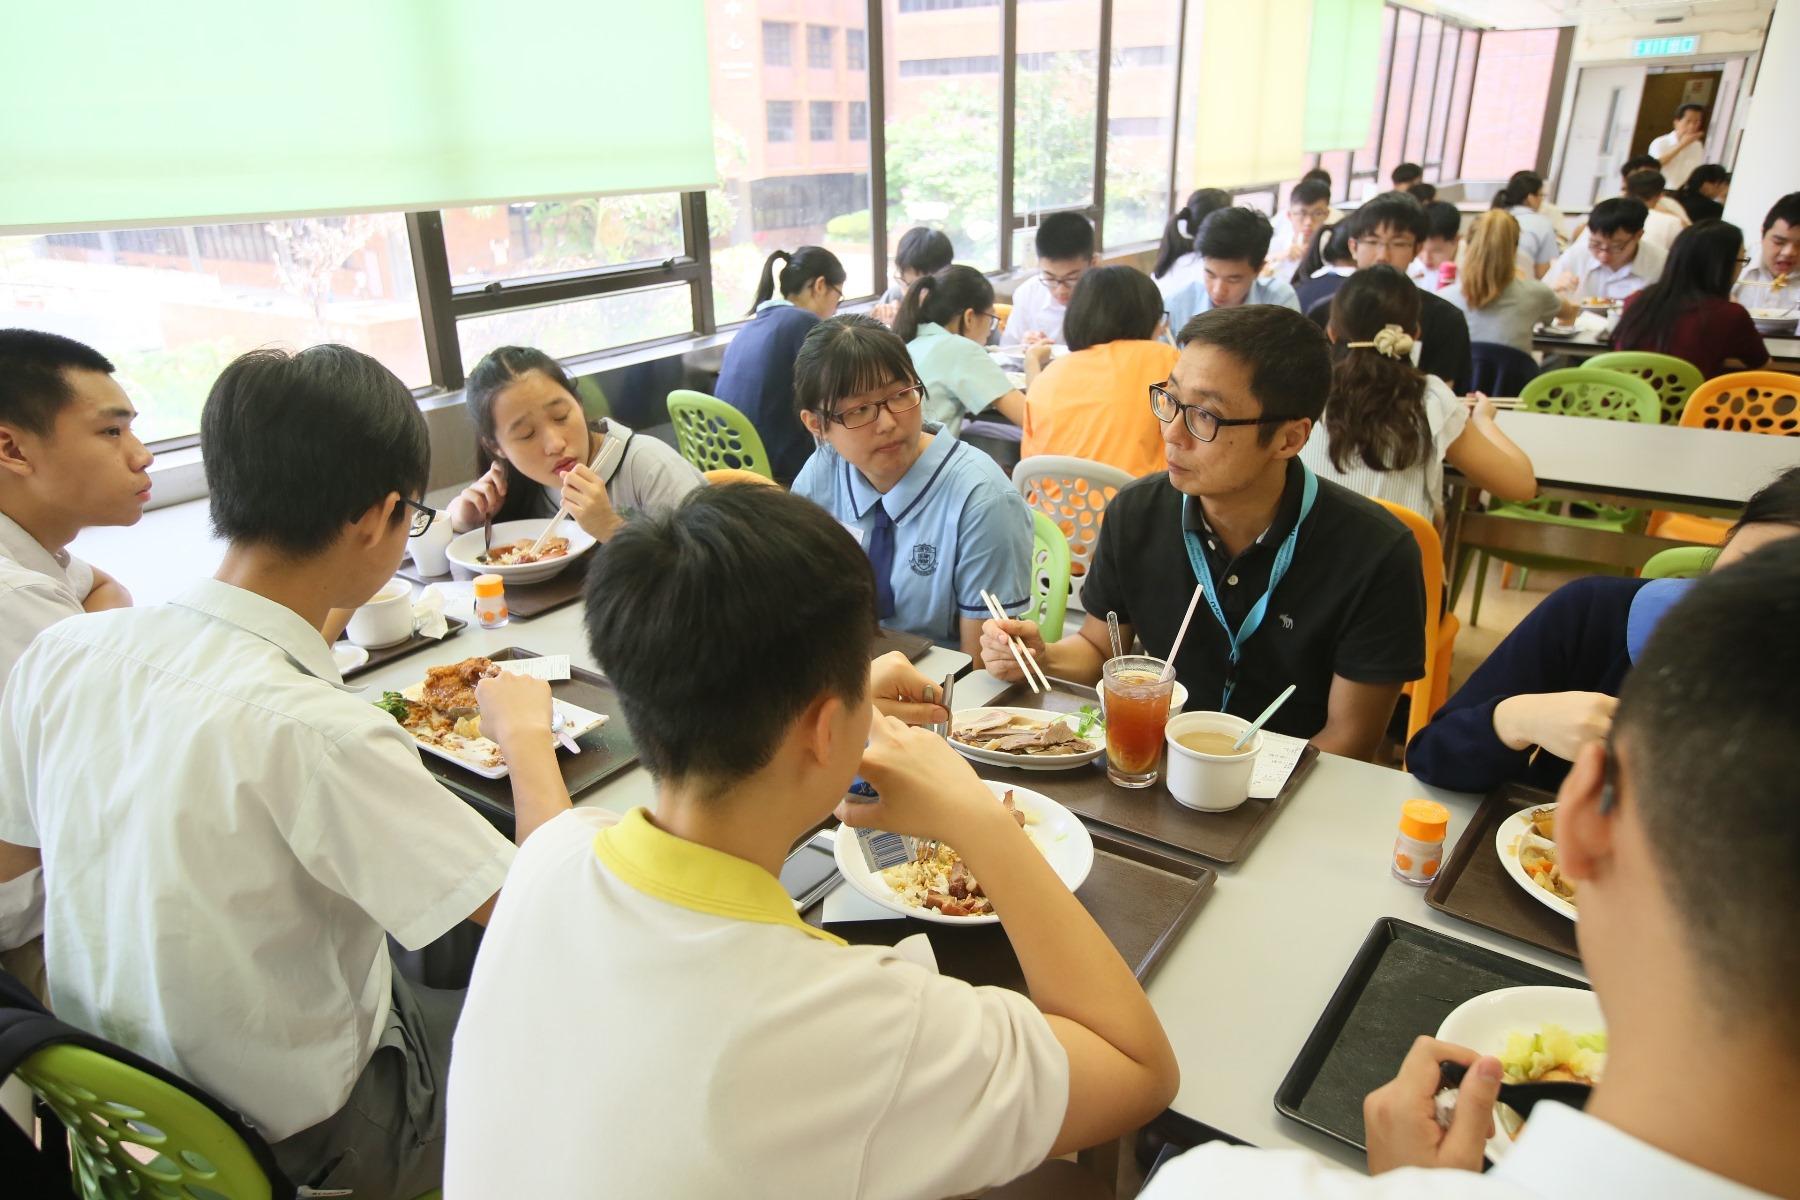 http://www.npc.edu.hk/sites/default/files/img_2781.jpg